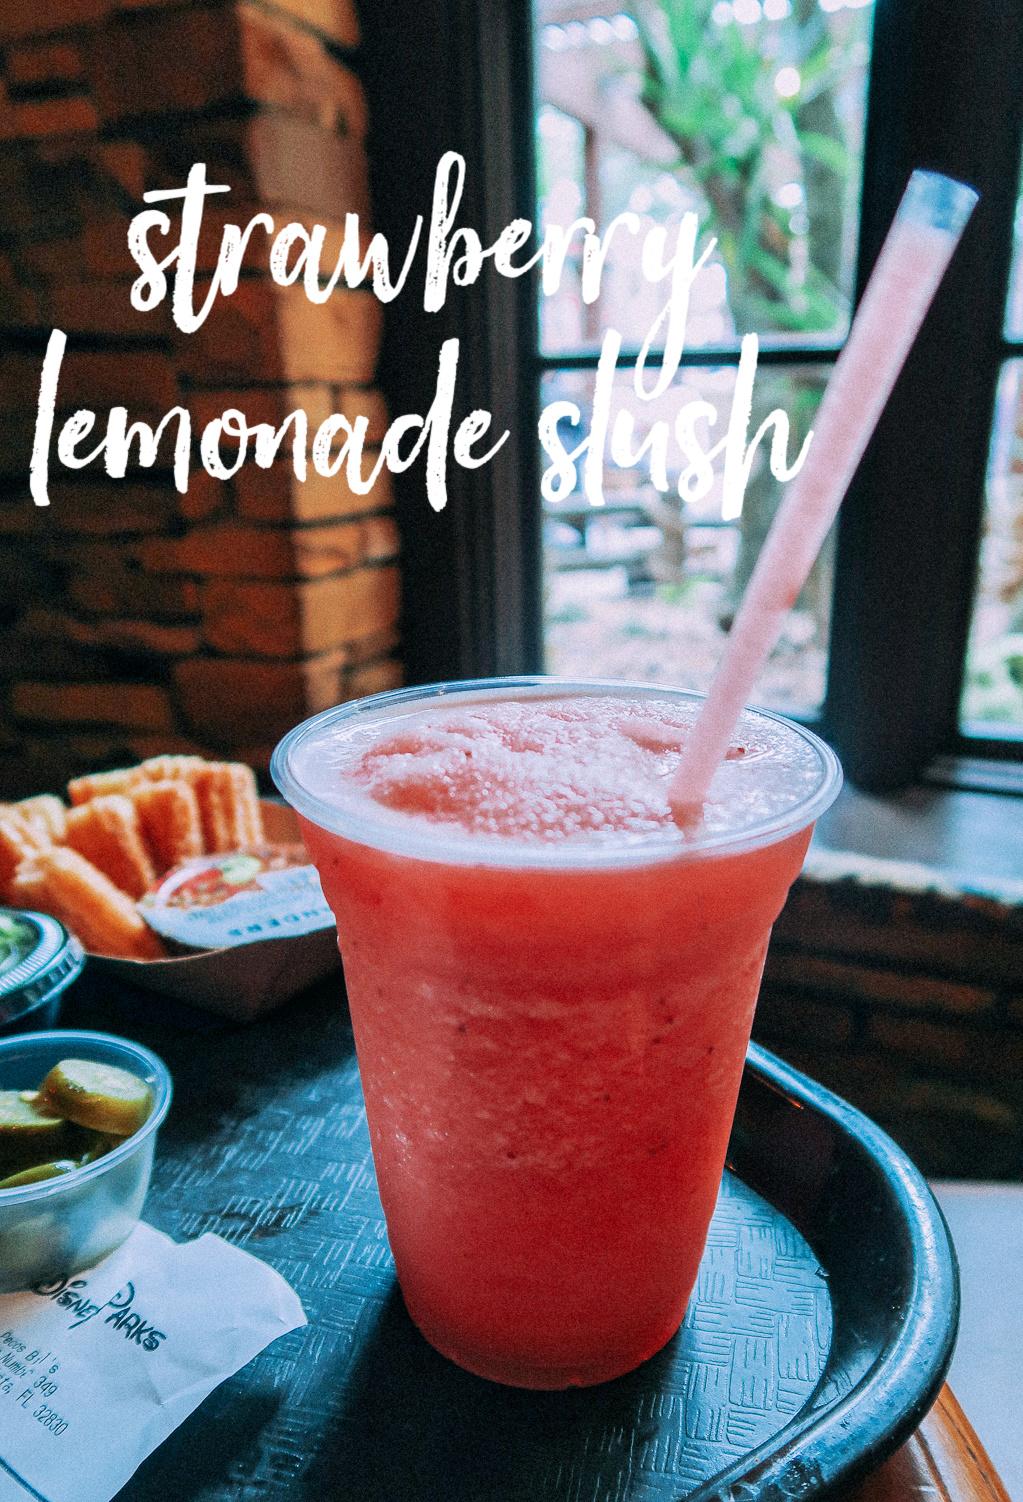 Tall Tale Inn And Cafe Pecos Bill Disney Magic Kingdom Food Strawberry Lemonade Slush